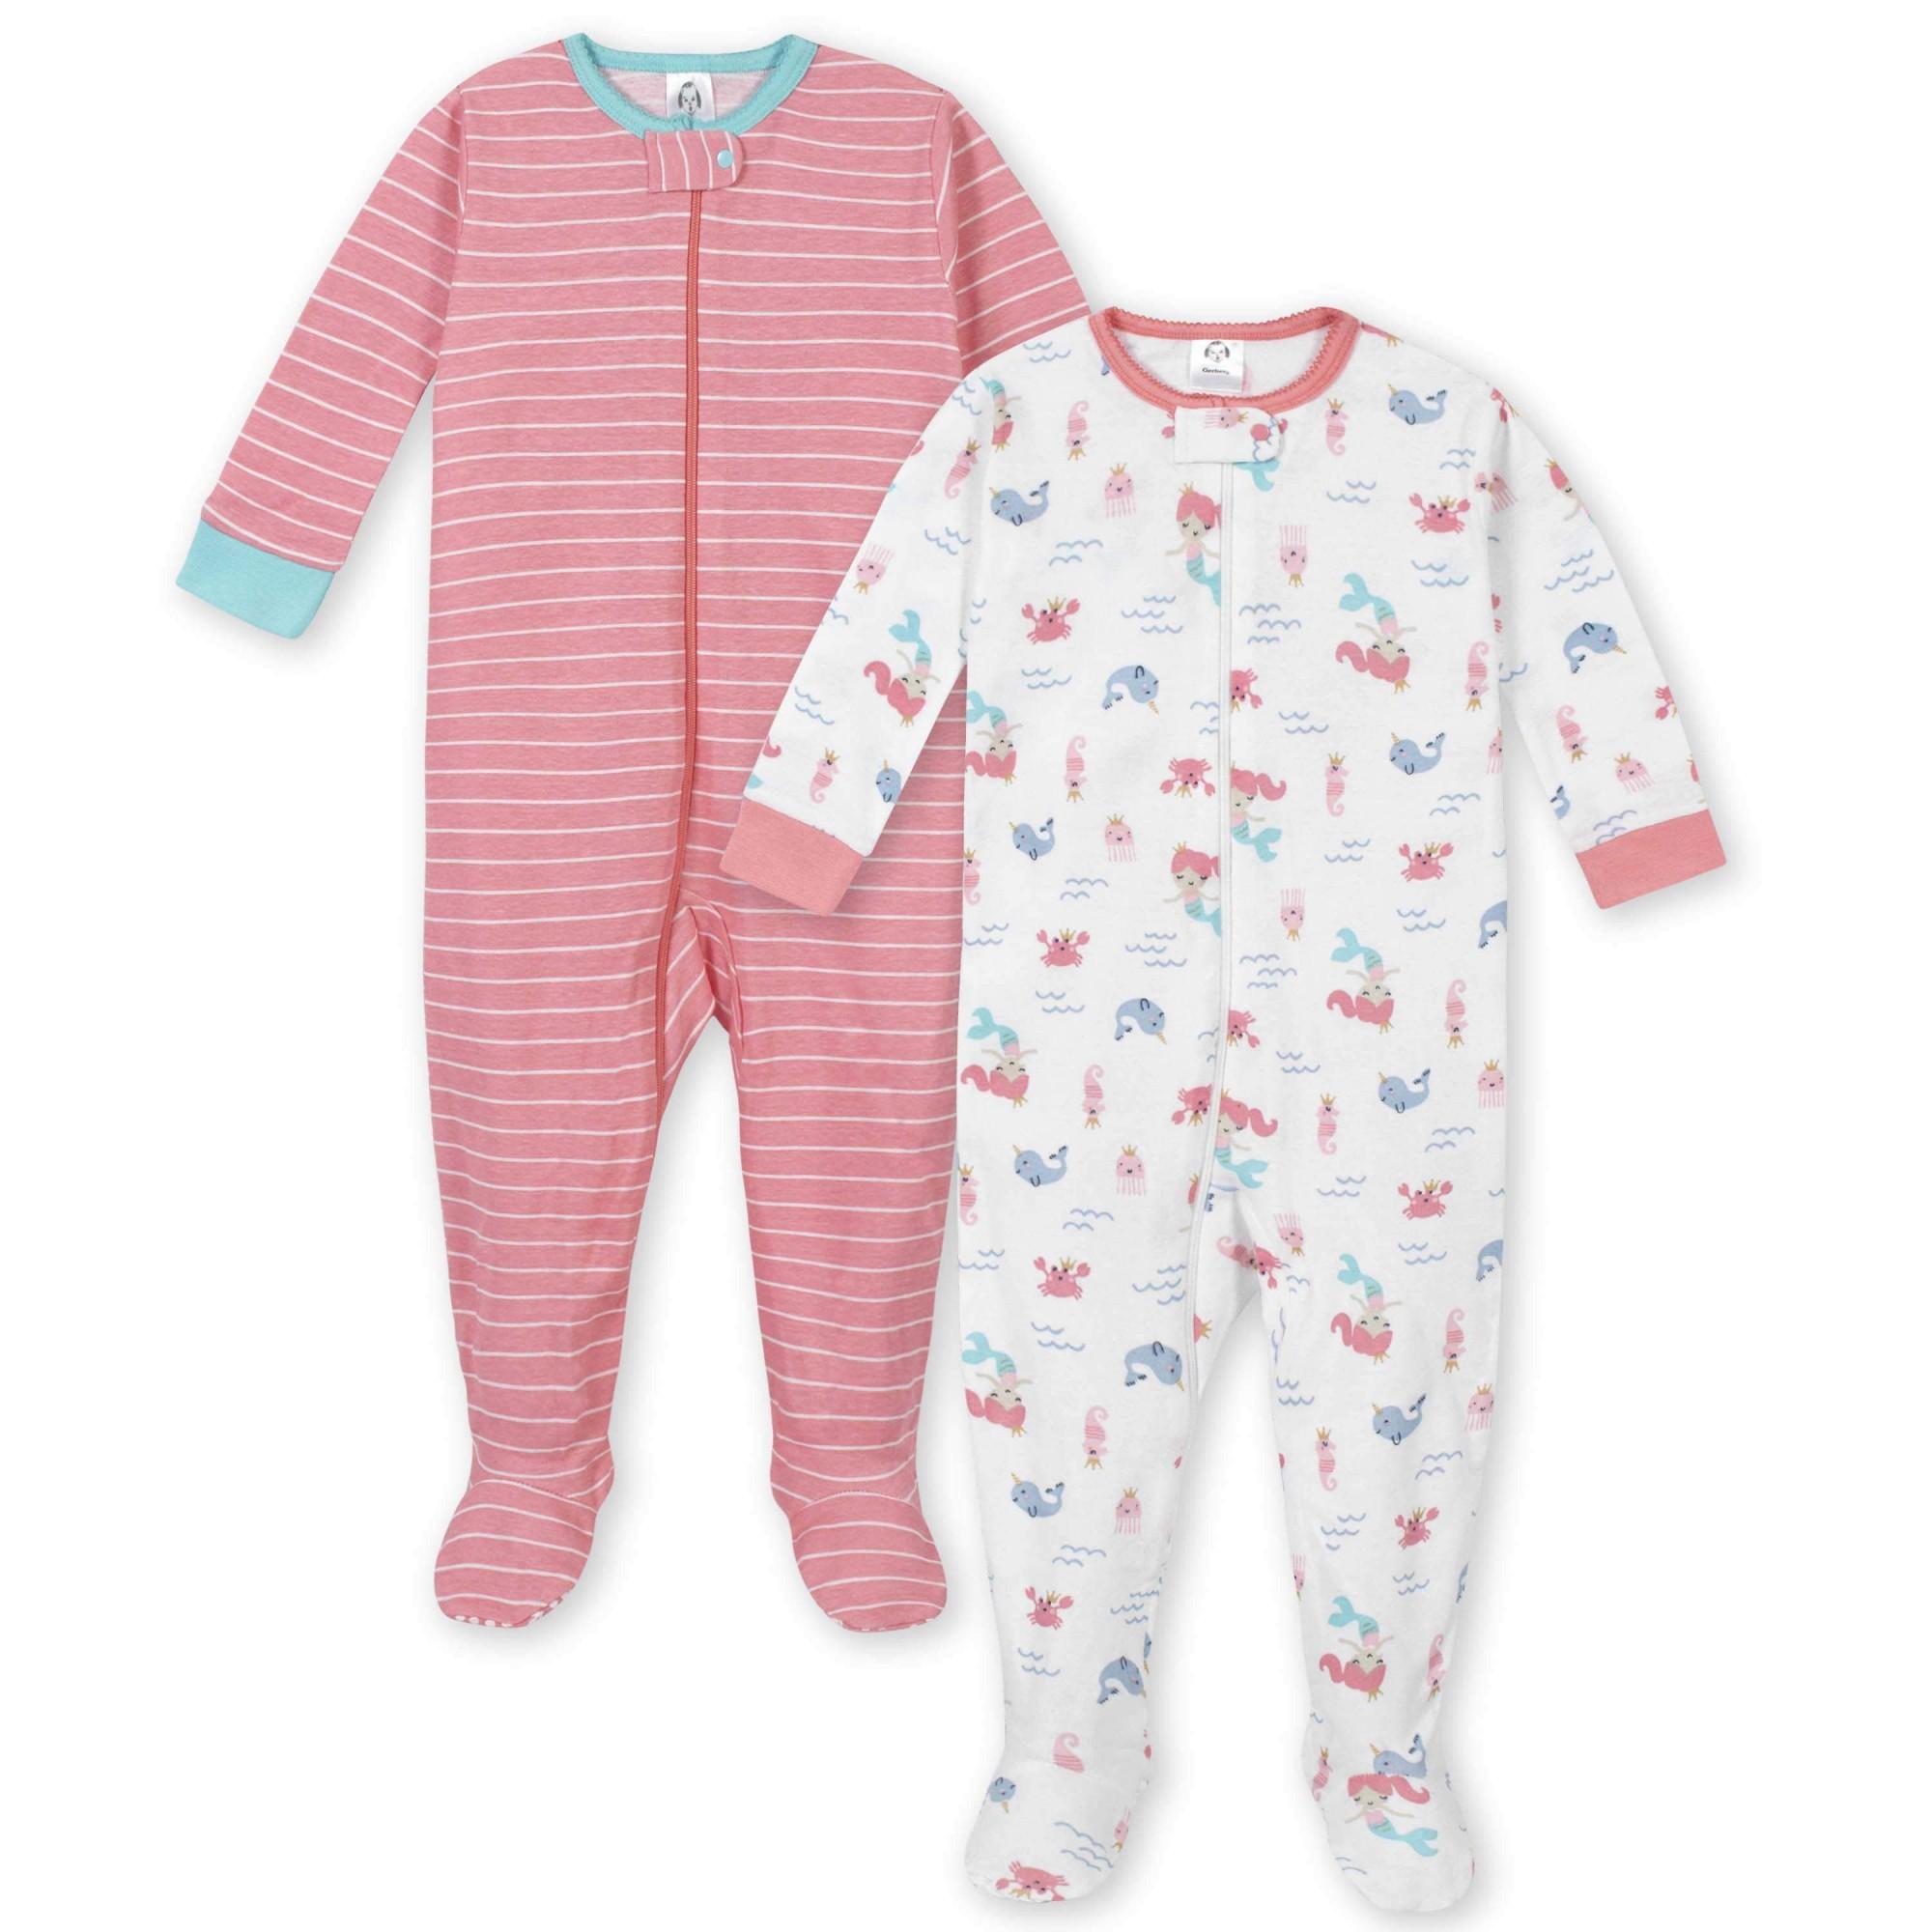 Kit com 2 Pijamas - Sereia - Gerber